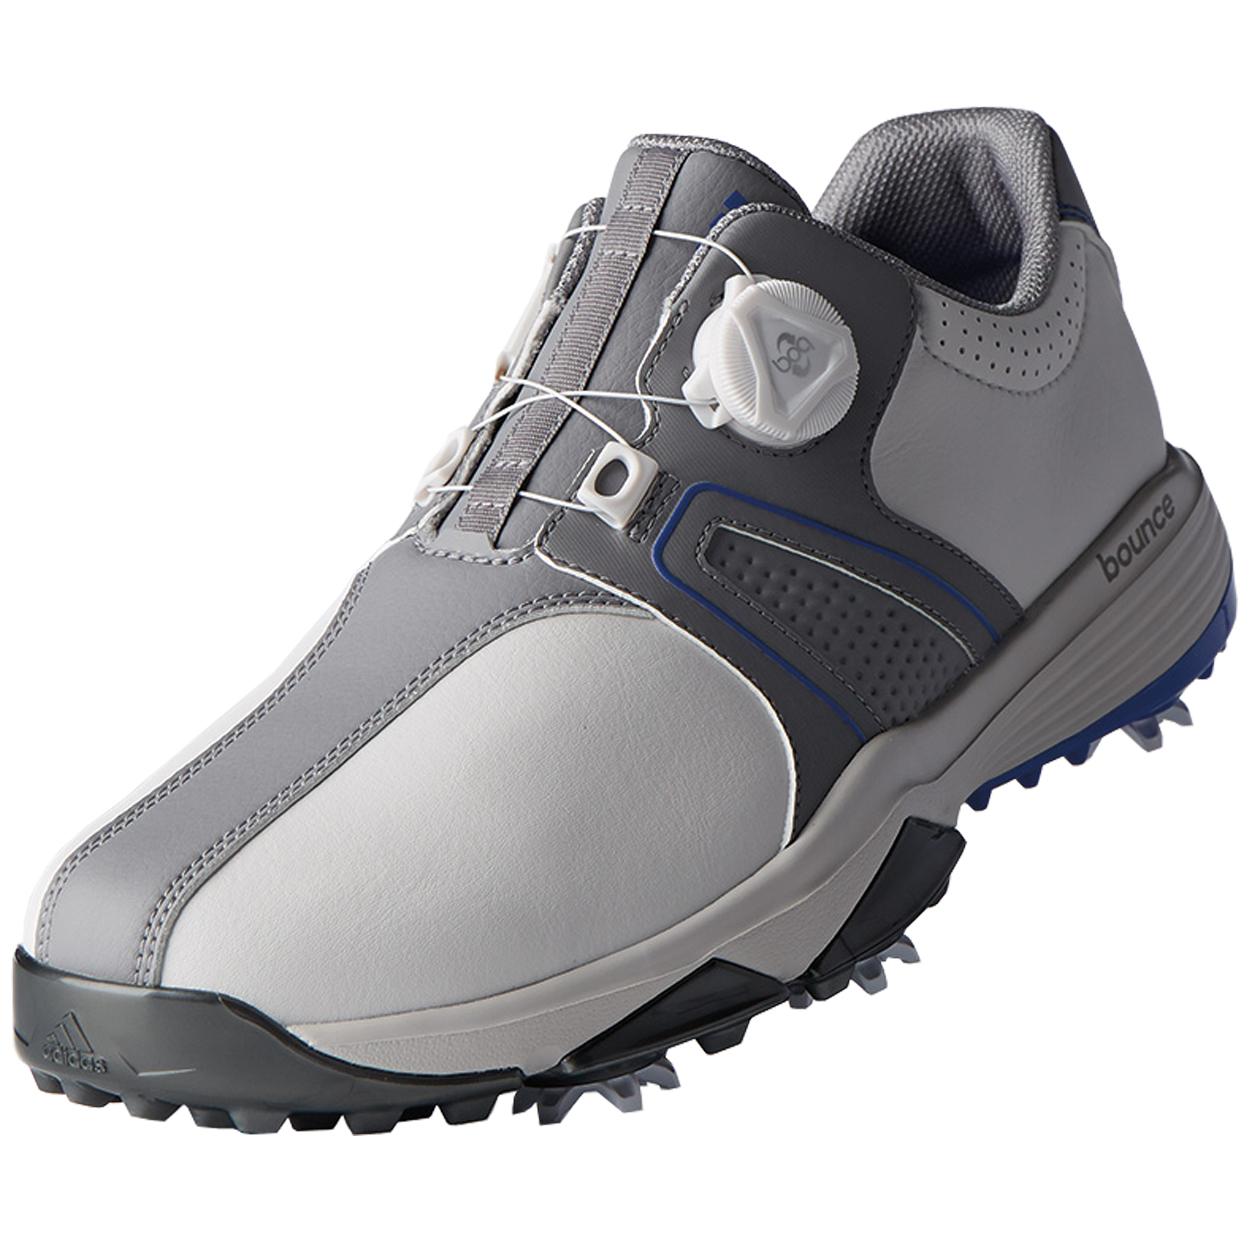 8f1a2d061 Adidas 360 Traxion Golf Shoes with Boa Closure - GolfEtail.com